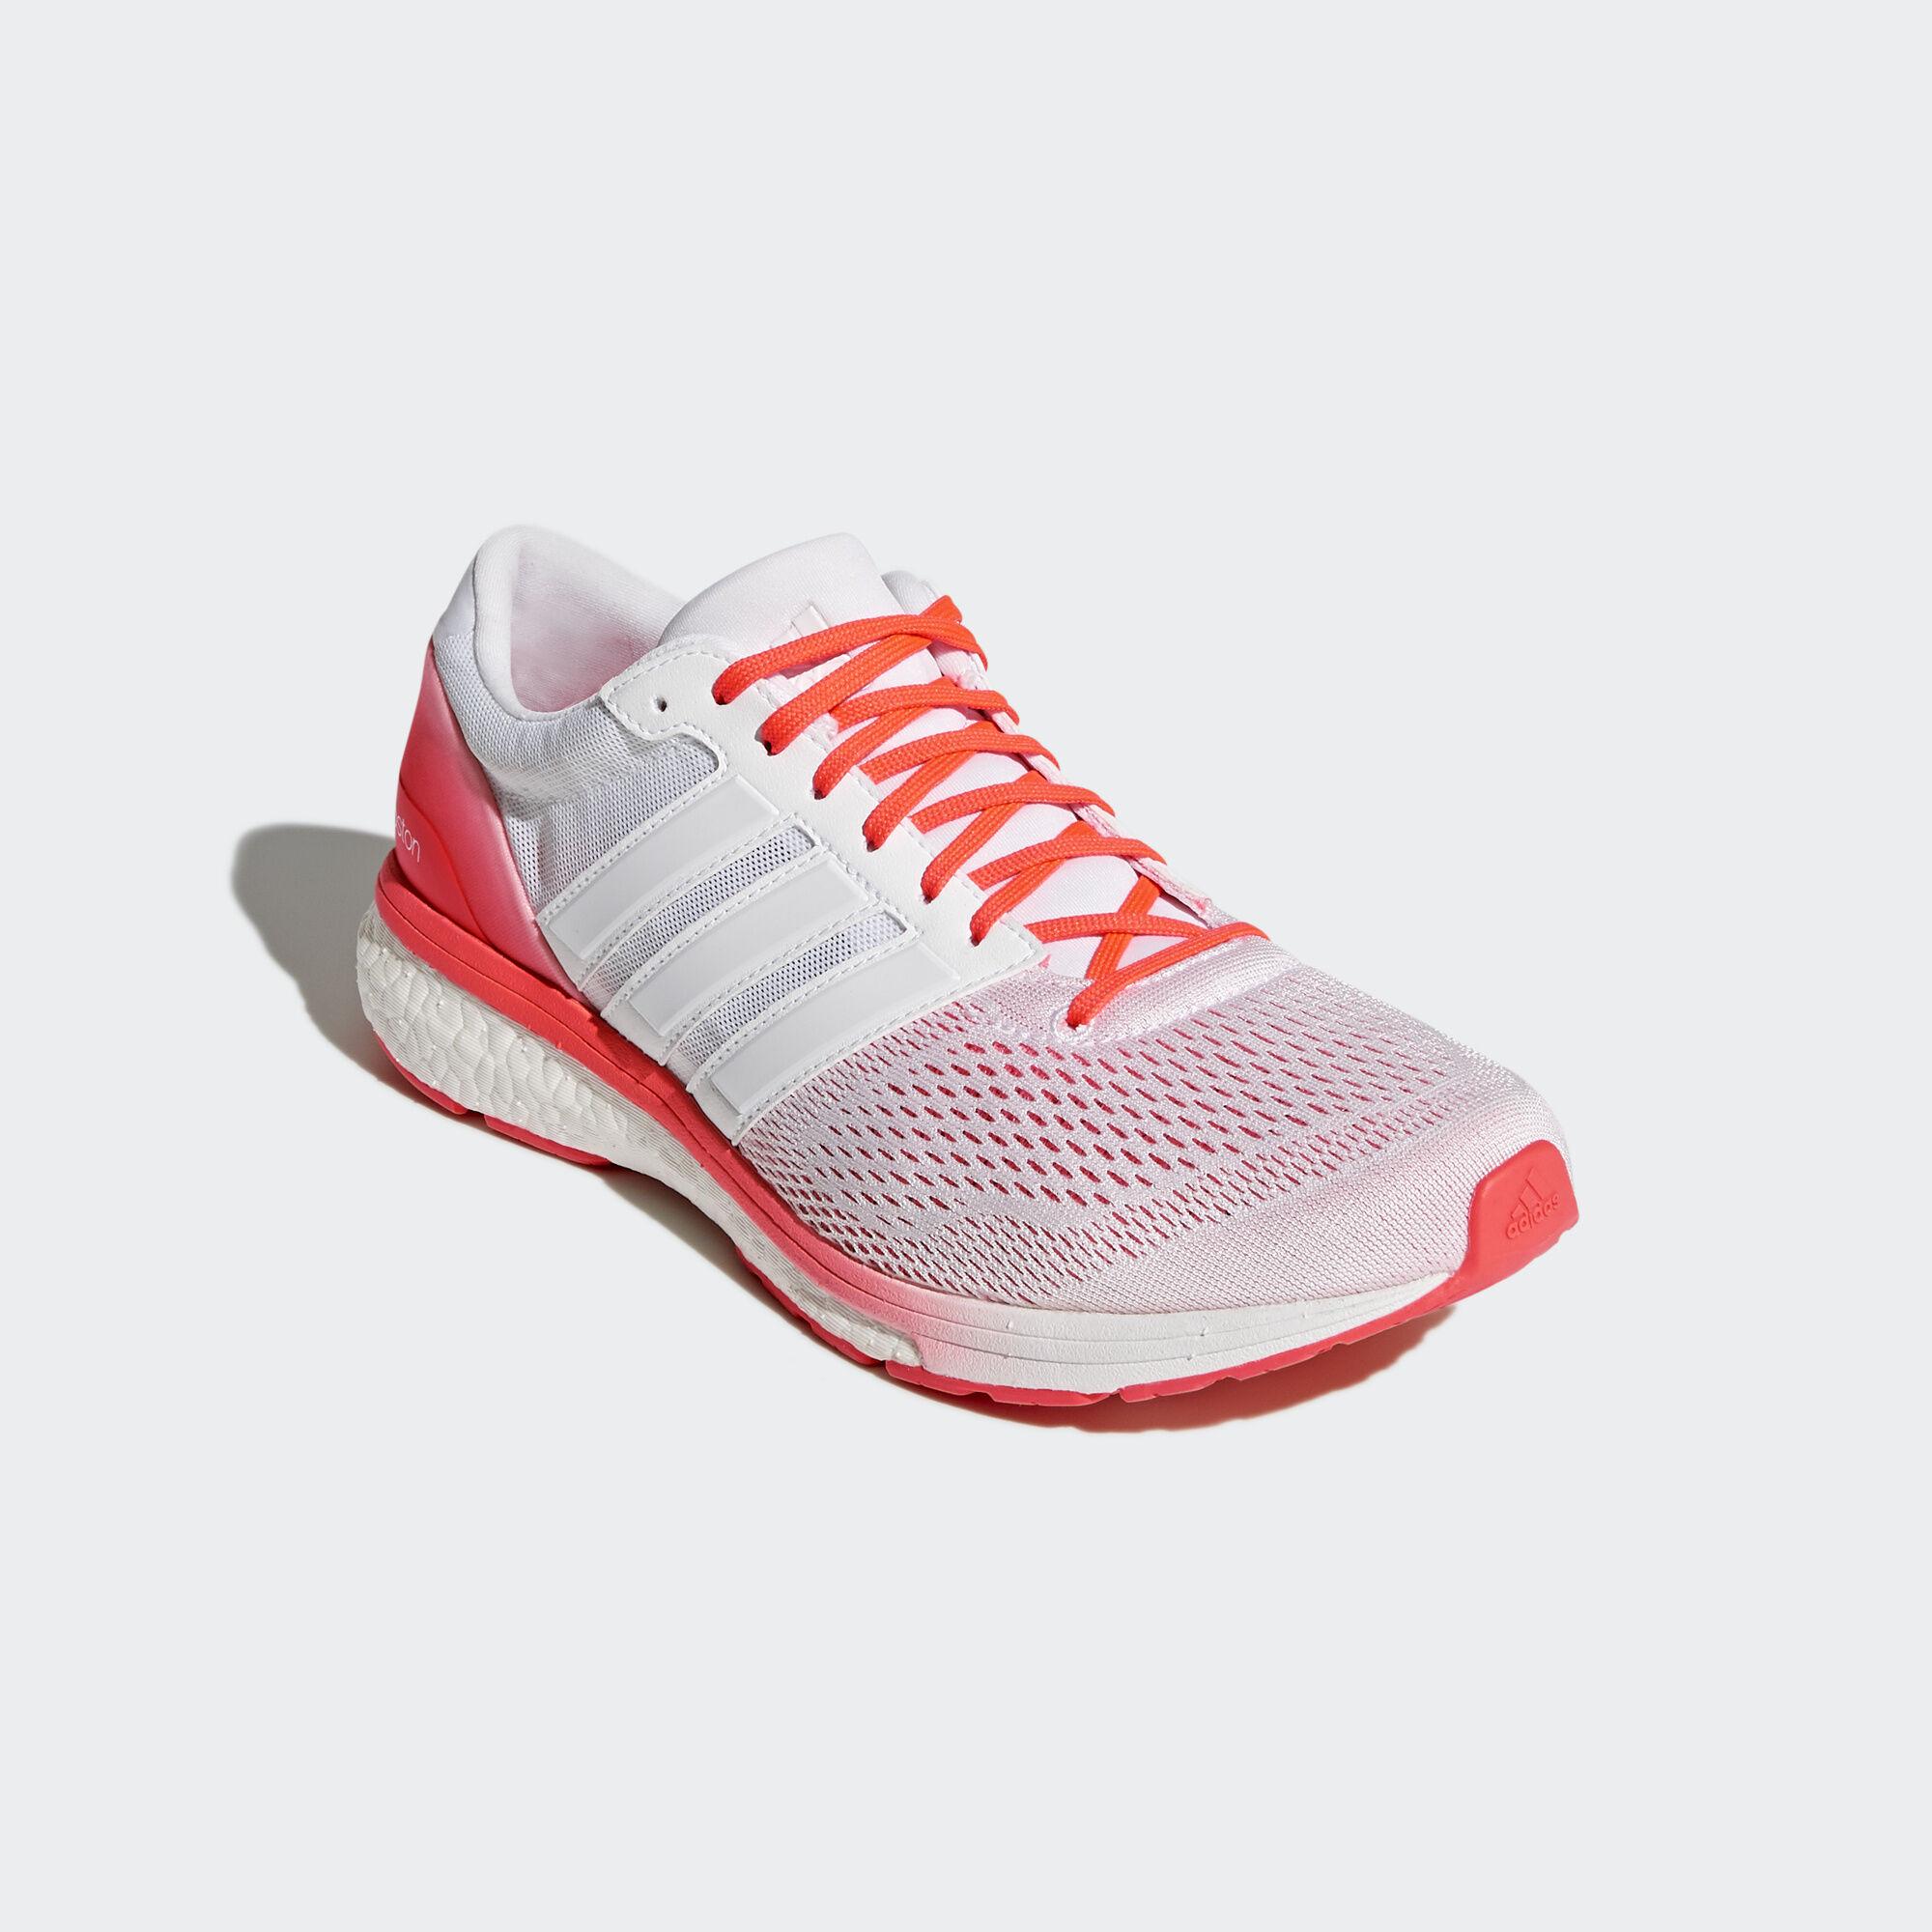 adidas - adizero Boston 6 Shoes Running White Ftw / Running White Ftw / Solar Red AQ5990